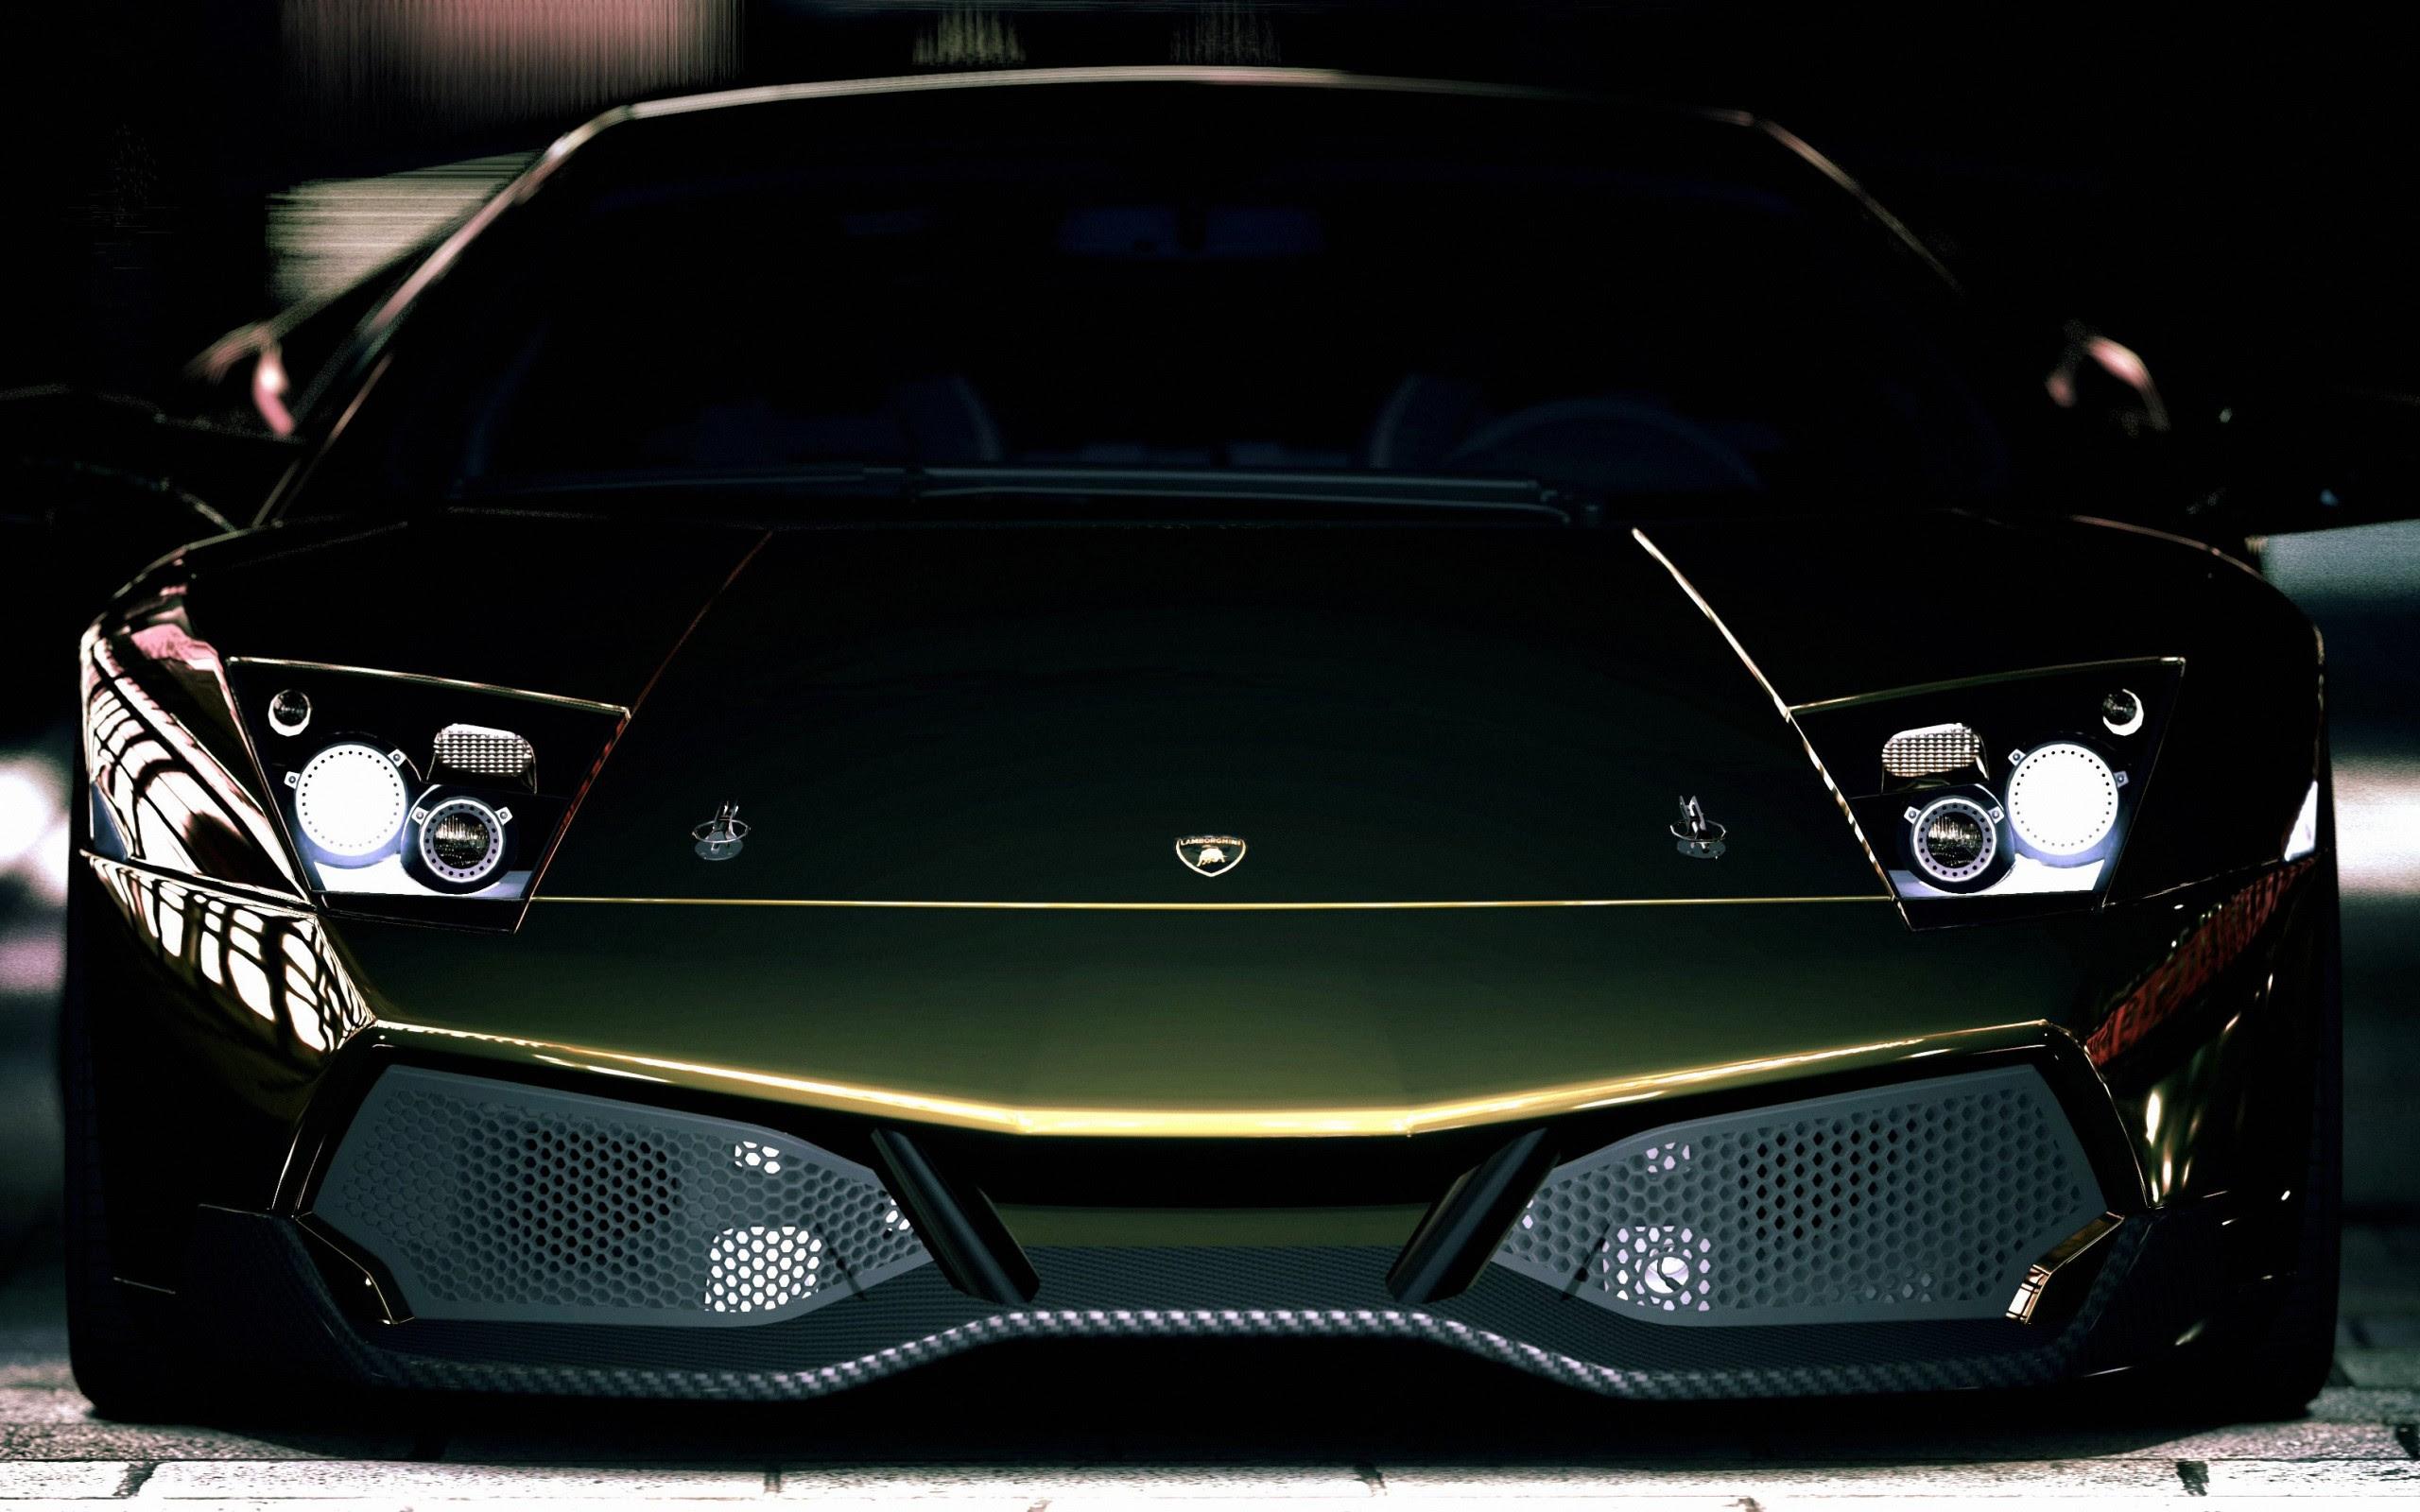 Lamborghini Wallpapers Hd For Desktop Lamborghini 2016